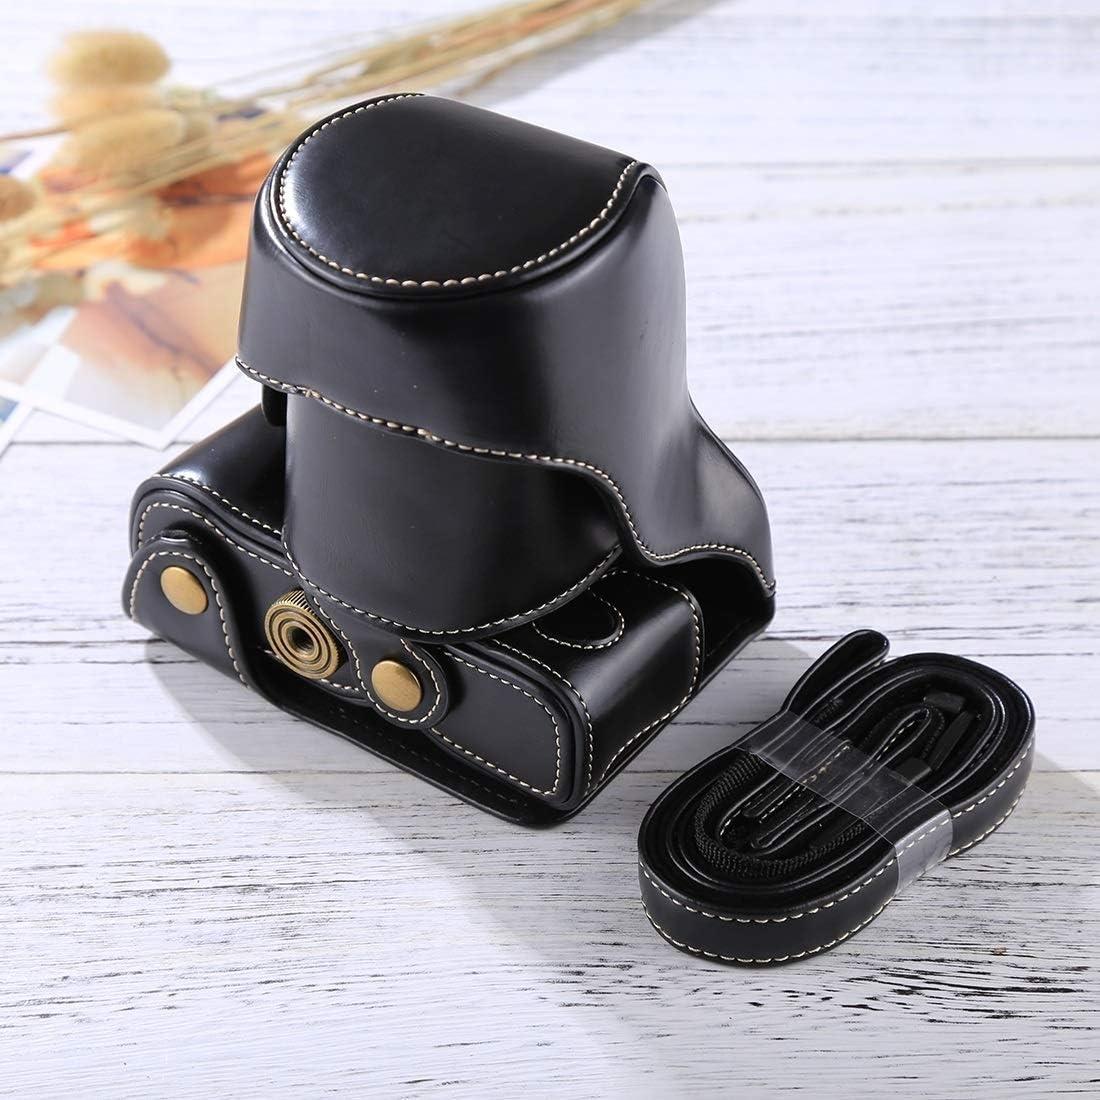 Ychaoya Camera Bag Wuzpx Wide Body Camera PU Leather Case Bag with Strap for FUJIFILM X-A3 // X-A2// X-M1 // X-A10 16-50mm // 18-55mm // XF 35mm Lens Black Color : Black